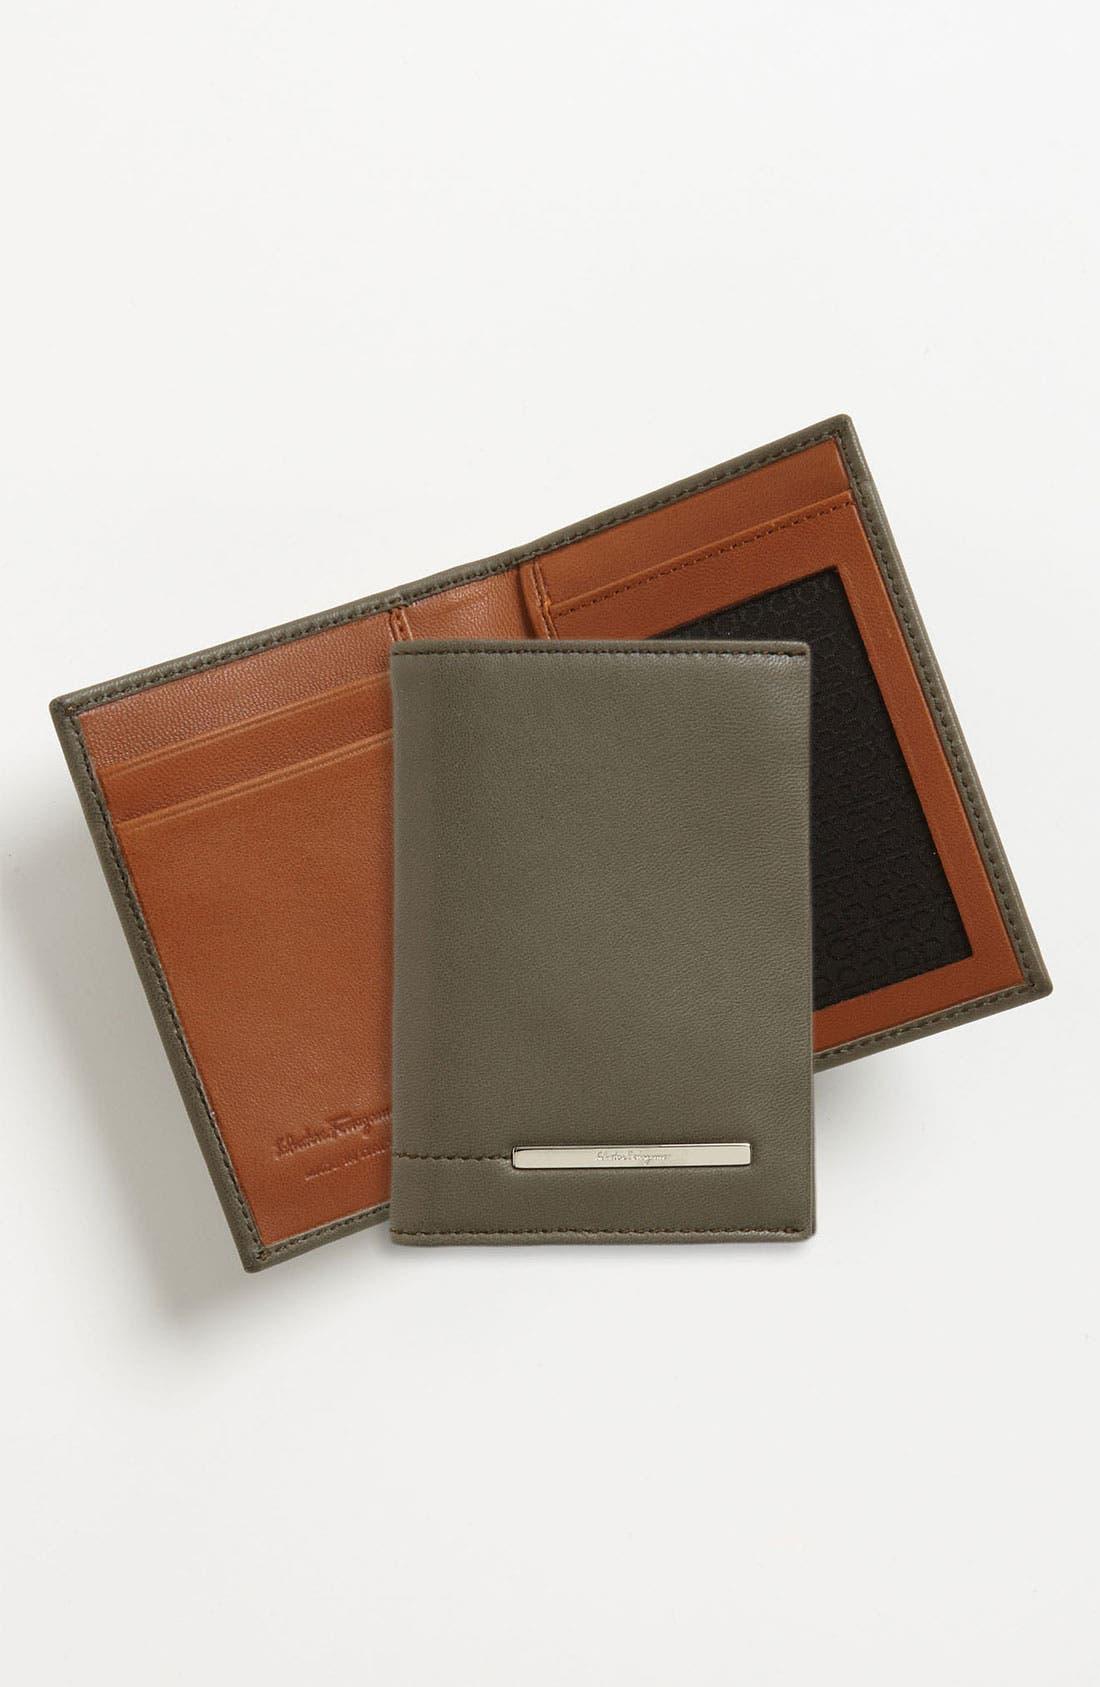 Main Image - Salvatore Ferragamo 'Giacomo' Card Case